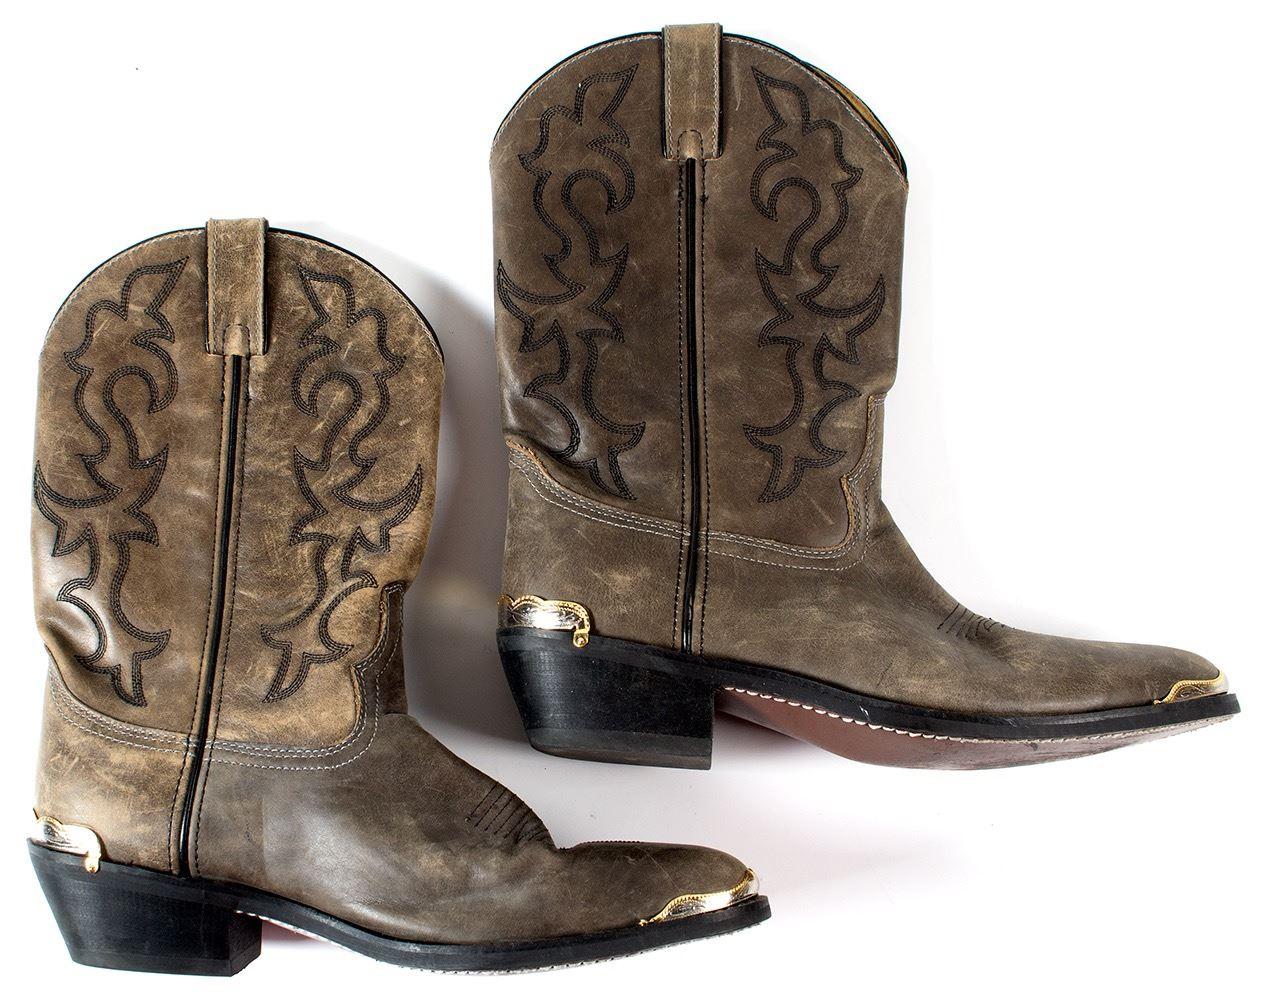 e00c34e6389 Smoky Mountain Fancy Cowboy Boots